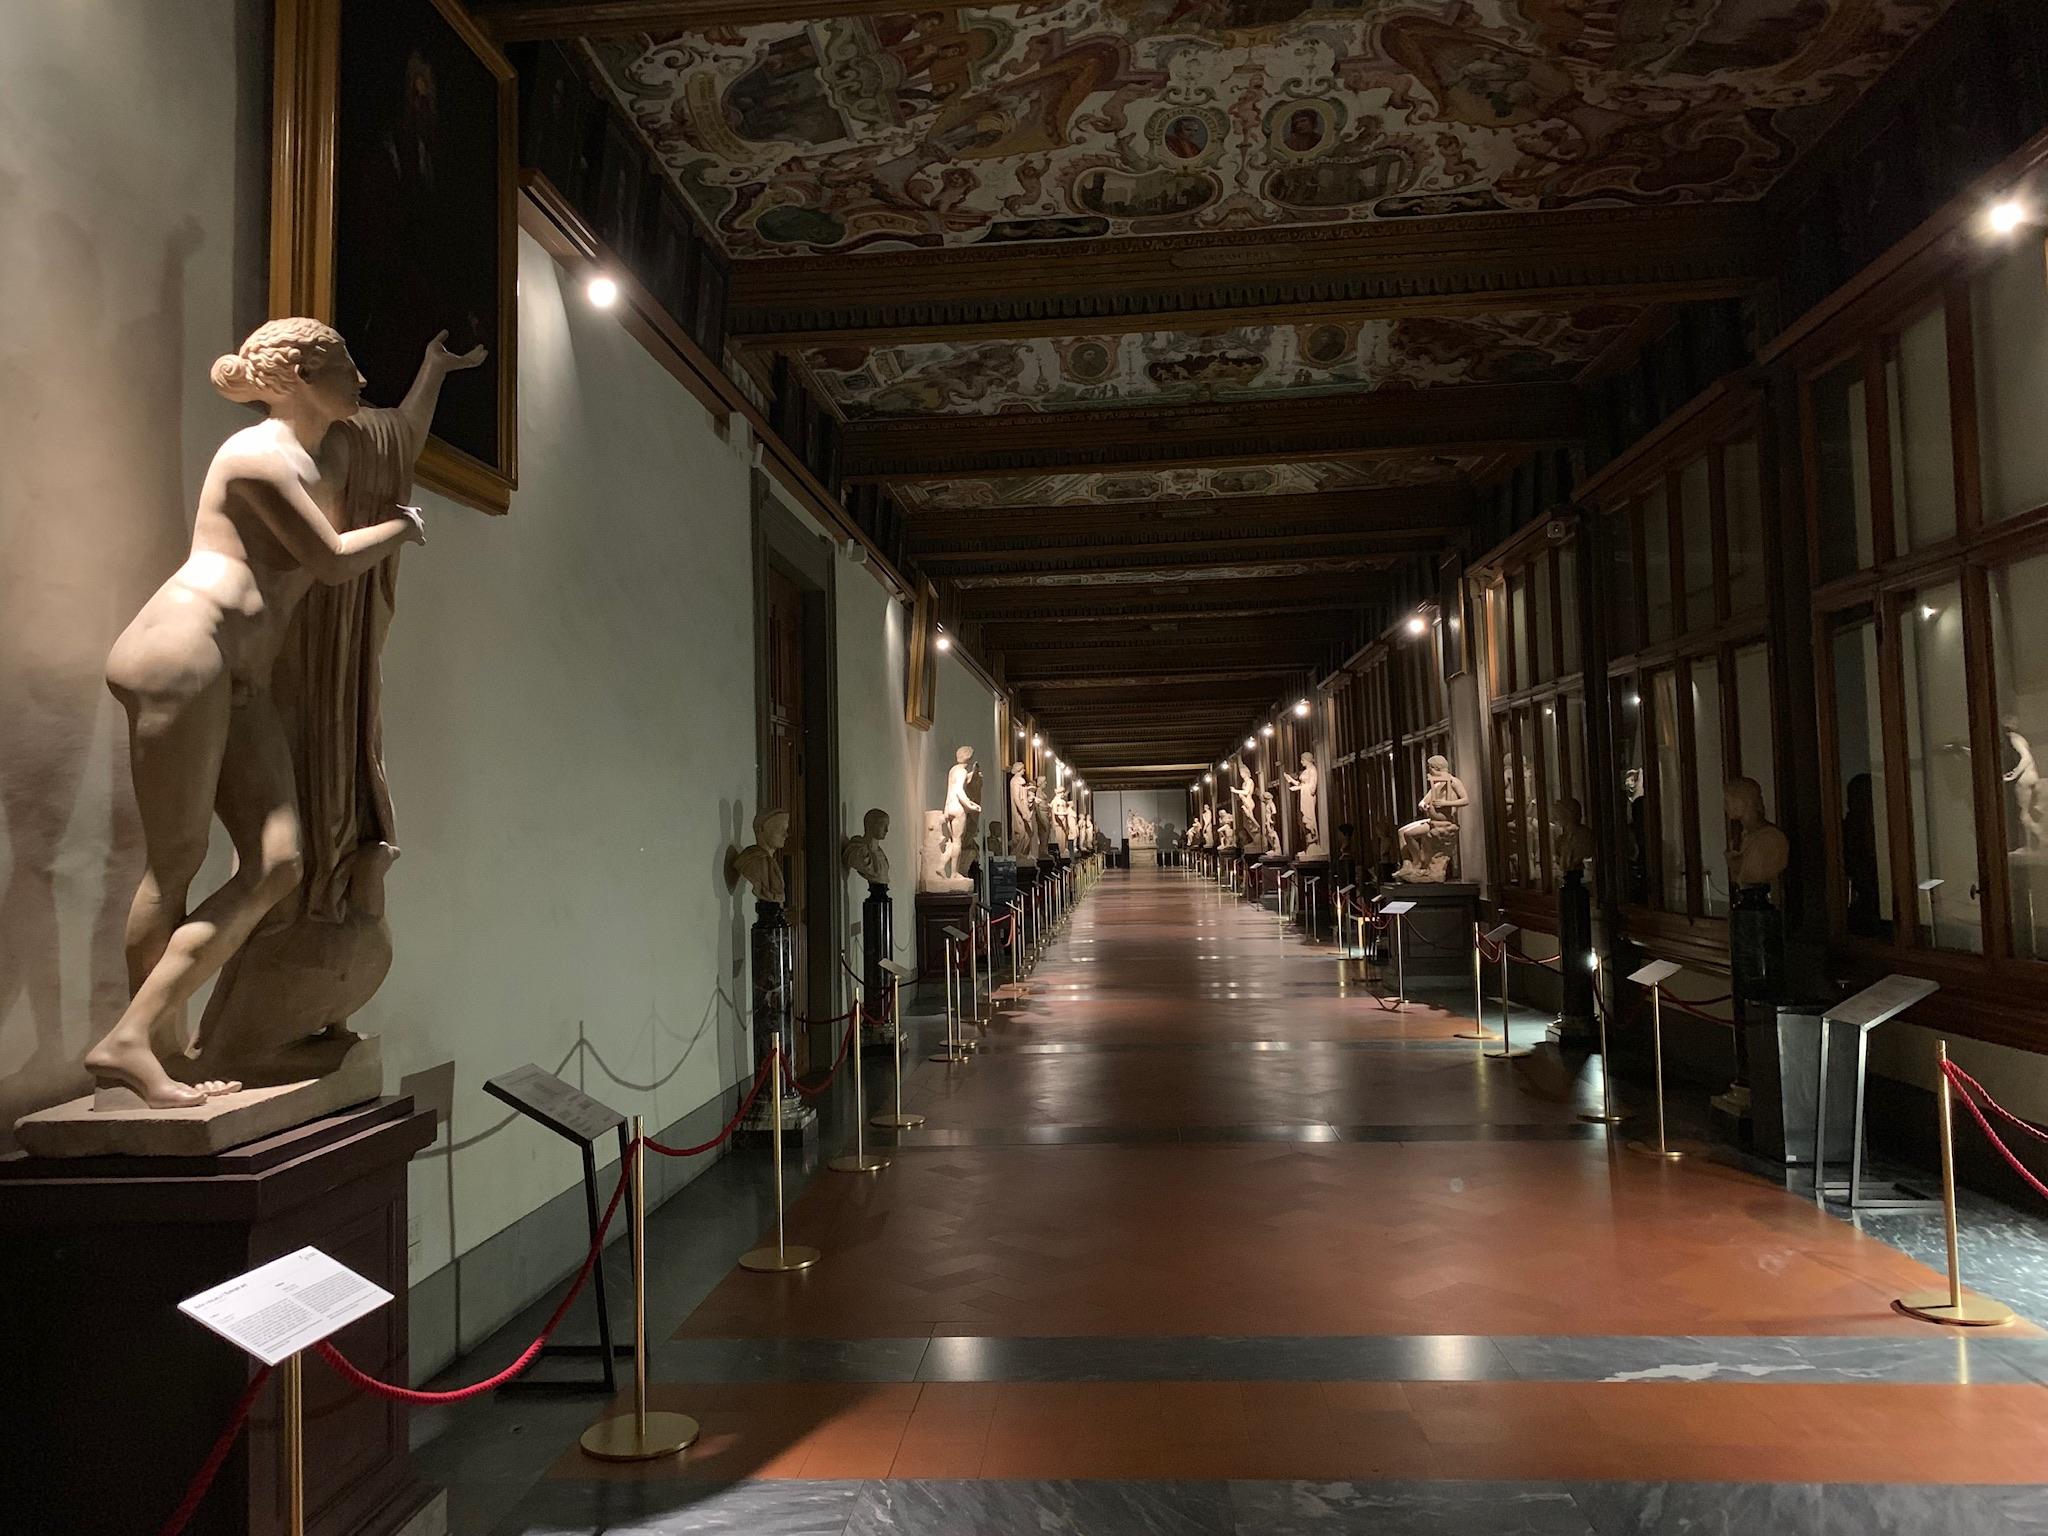 Agli Uffizi è boom di visite serali. Un segnale per far aprire sempre i musei di sera?